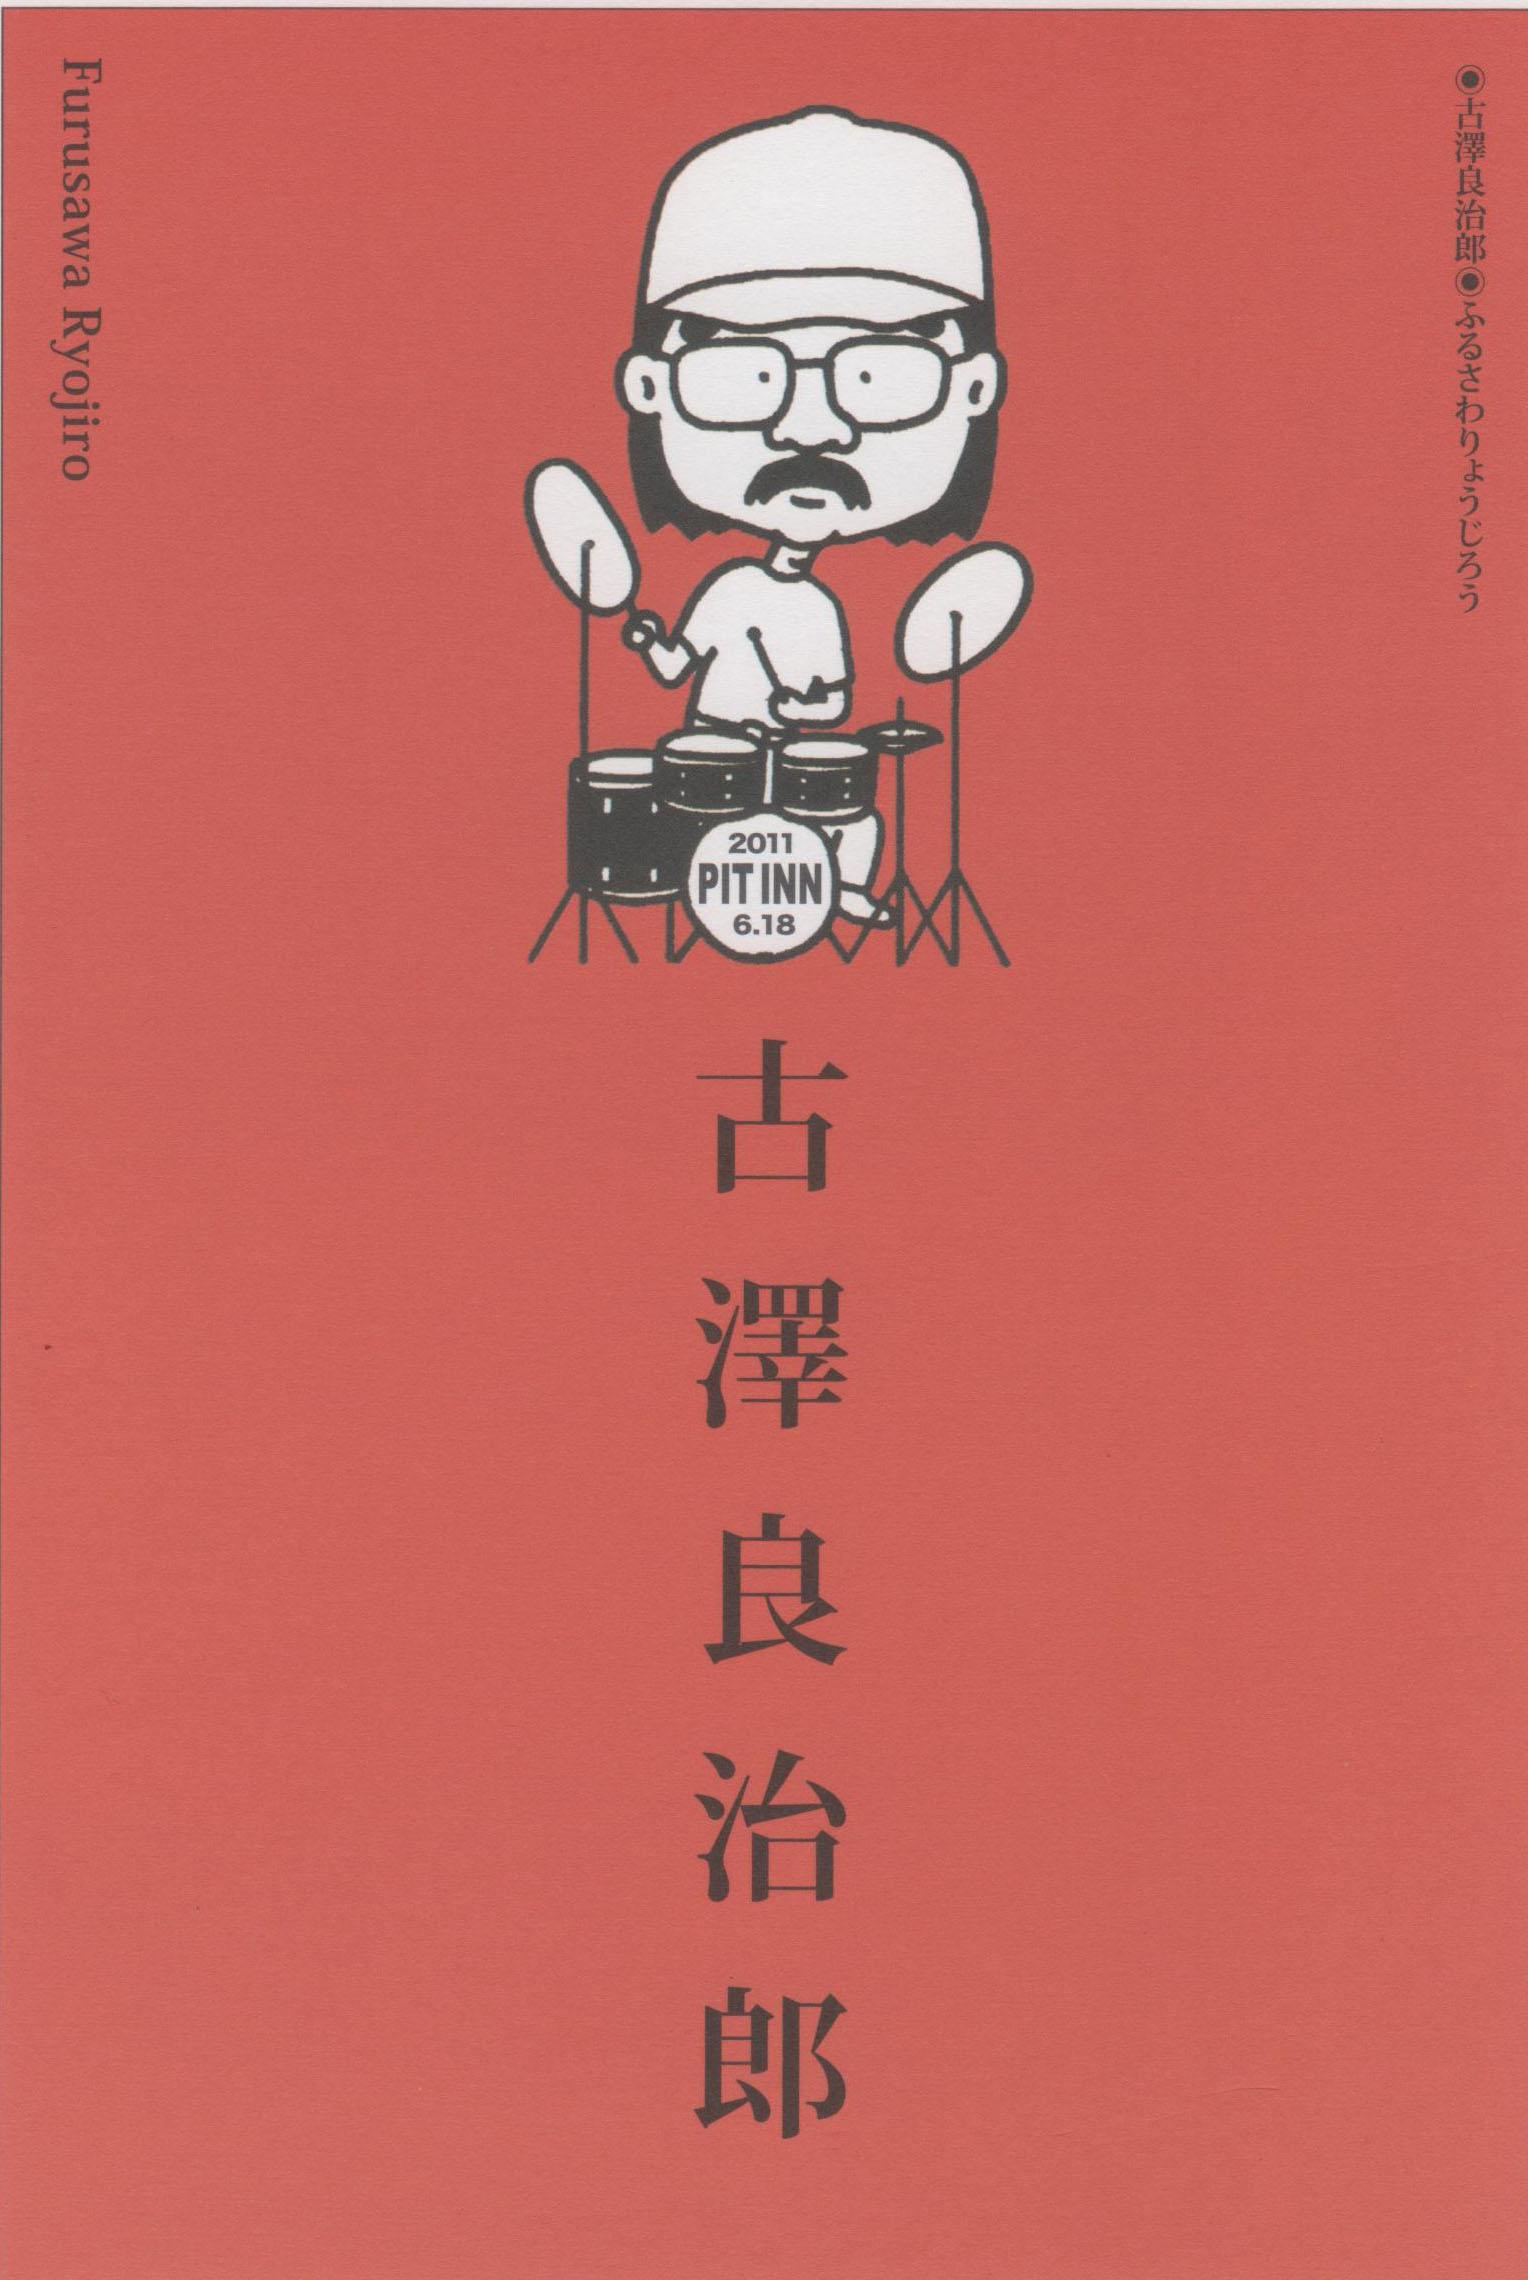 BOOK-FR-001